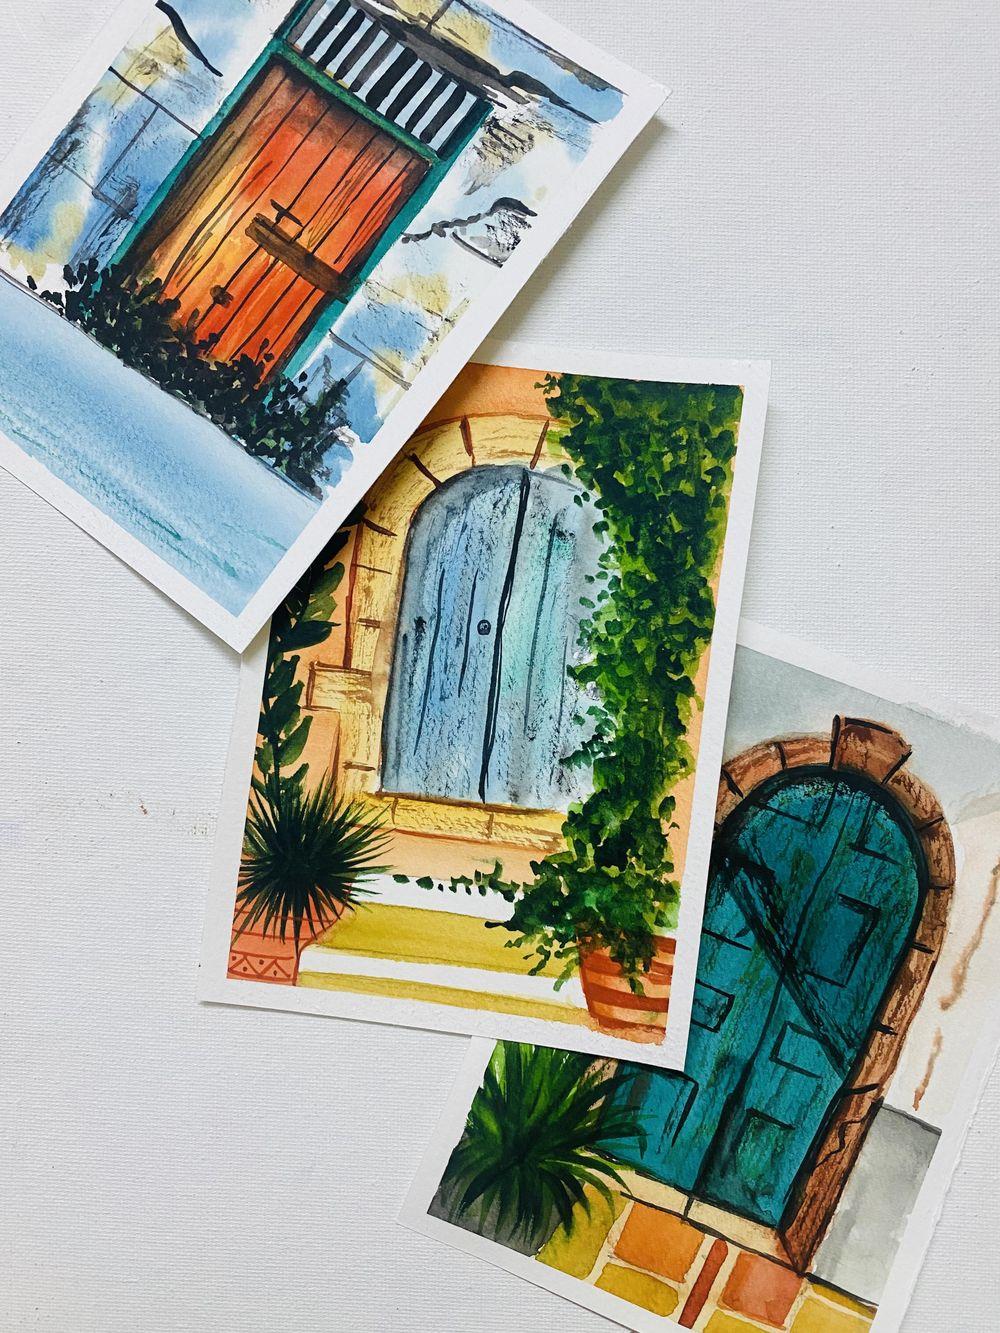 vintage doors - image 1 - student project